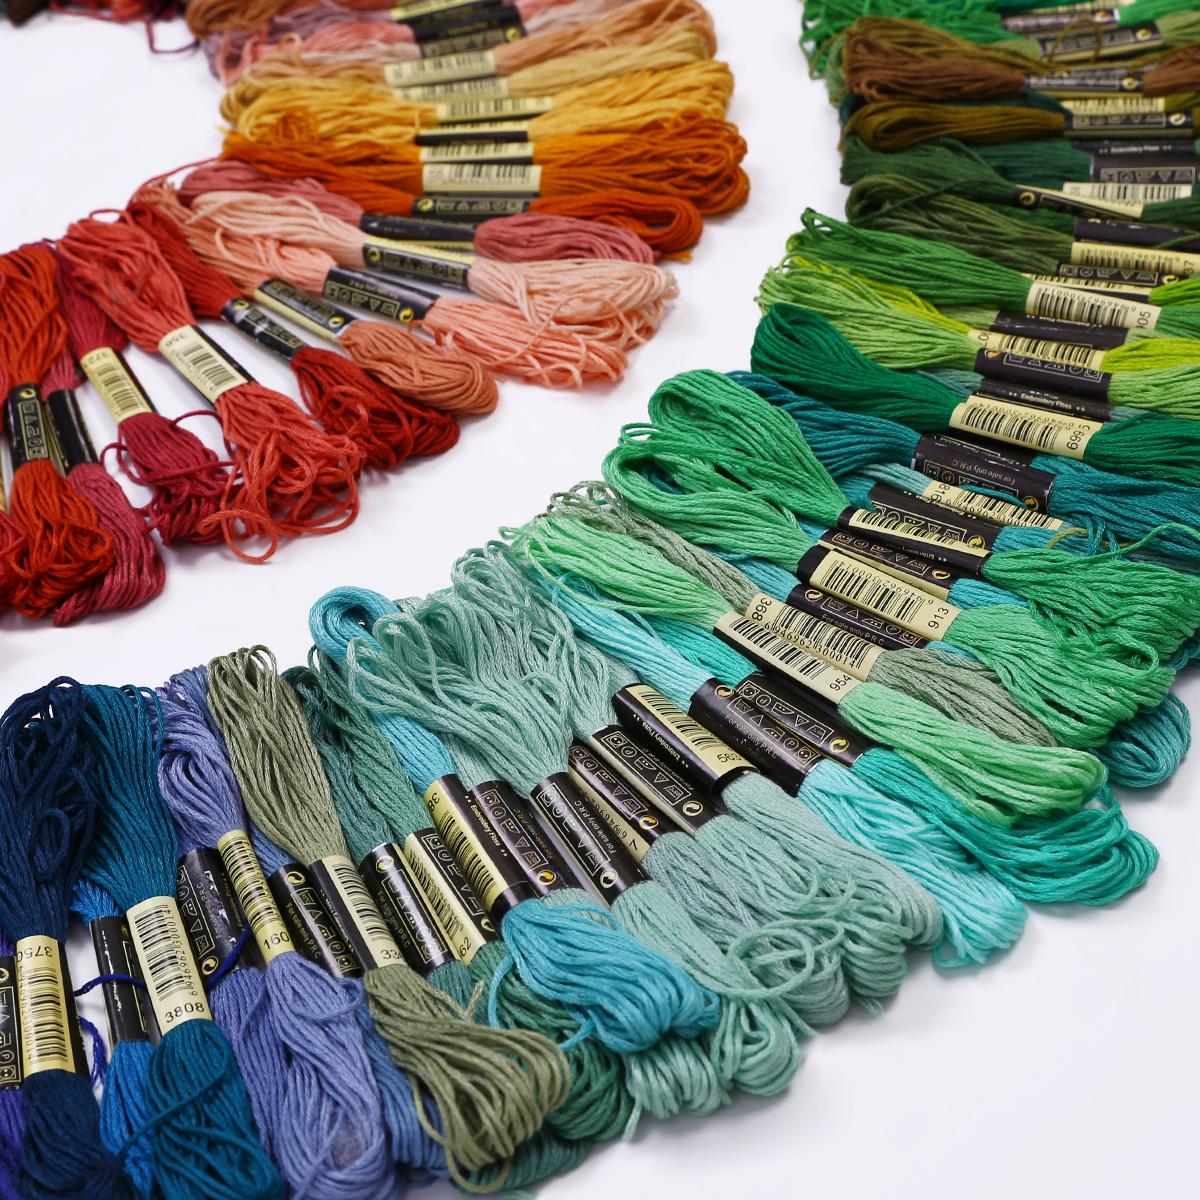 Lot 300 Multi Colors Cross Stitch Cotton Embroidery Thread